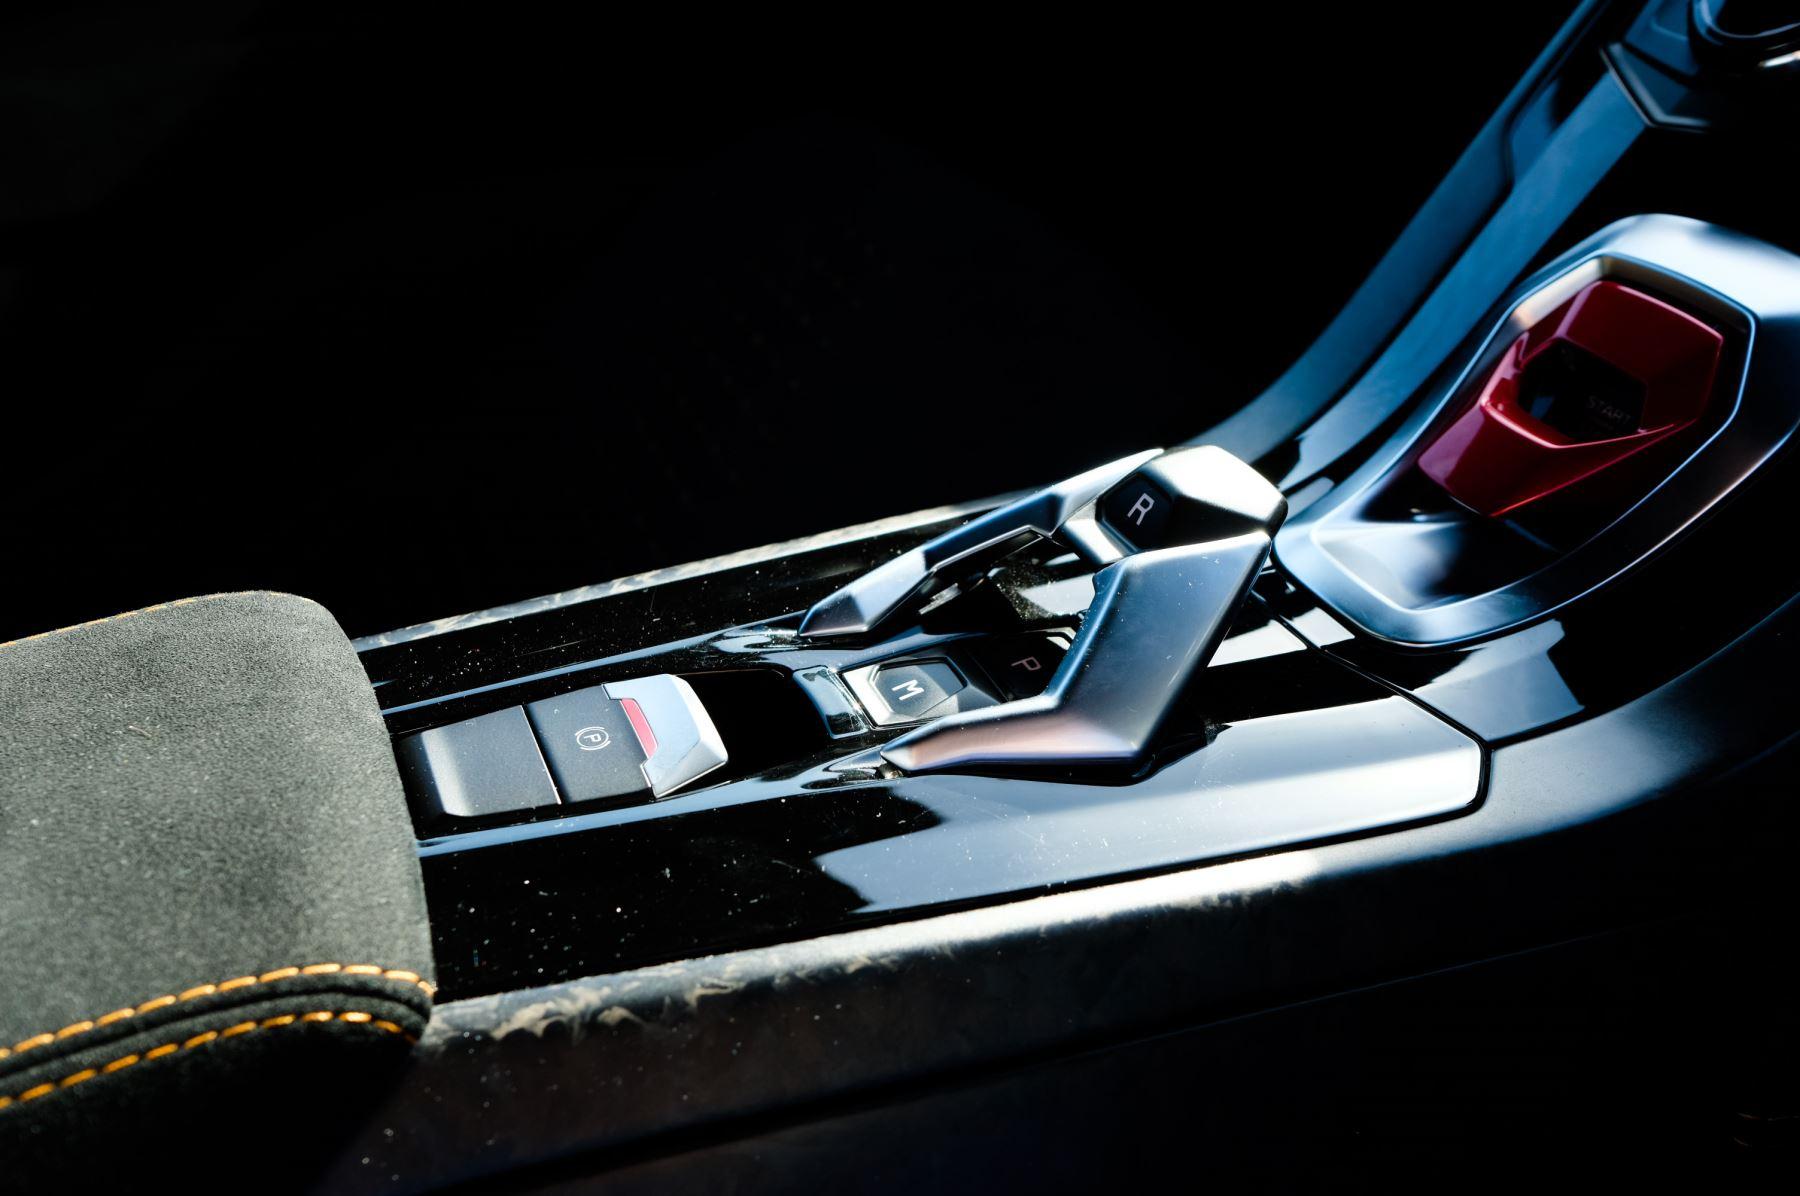 Lamborghini Huracan Performante LP 640-4 2dr LDF - Carbon Ceramic Brakes - Carbon Fiber Features - Comfort Seats image 21